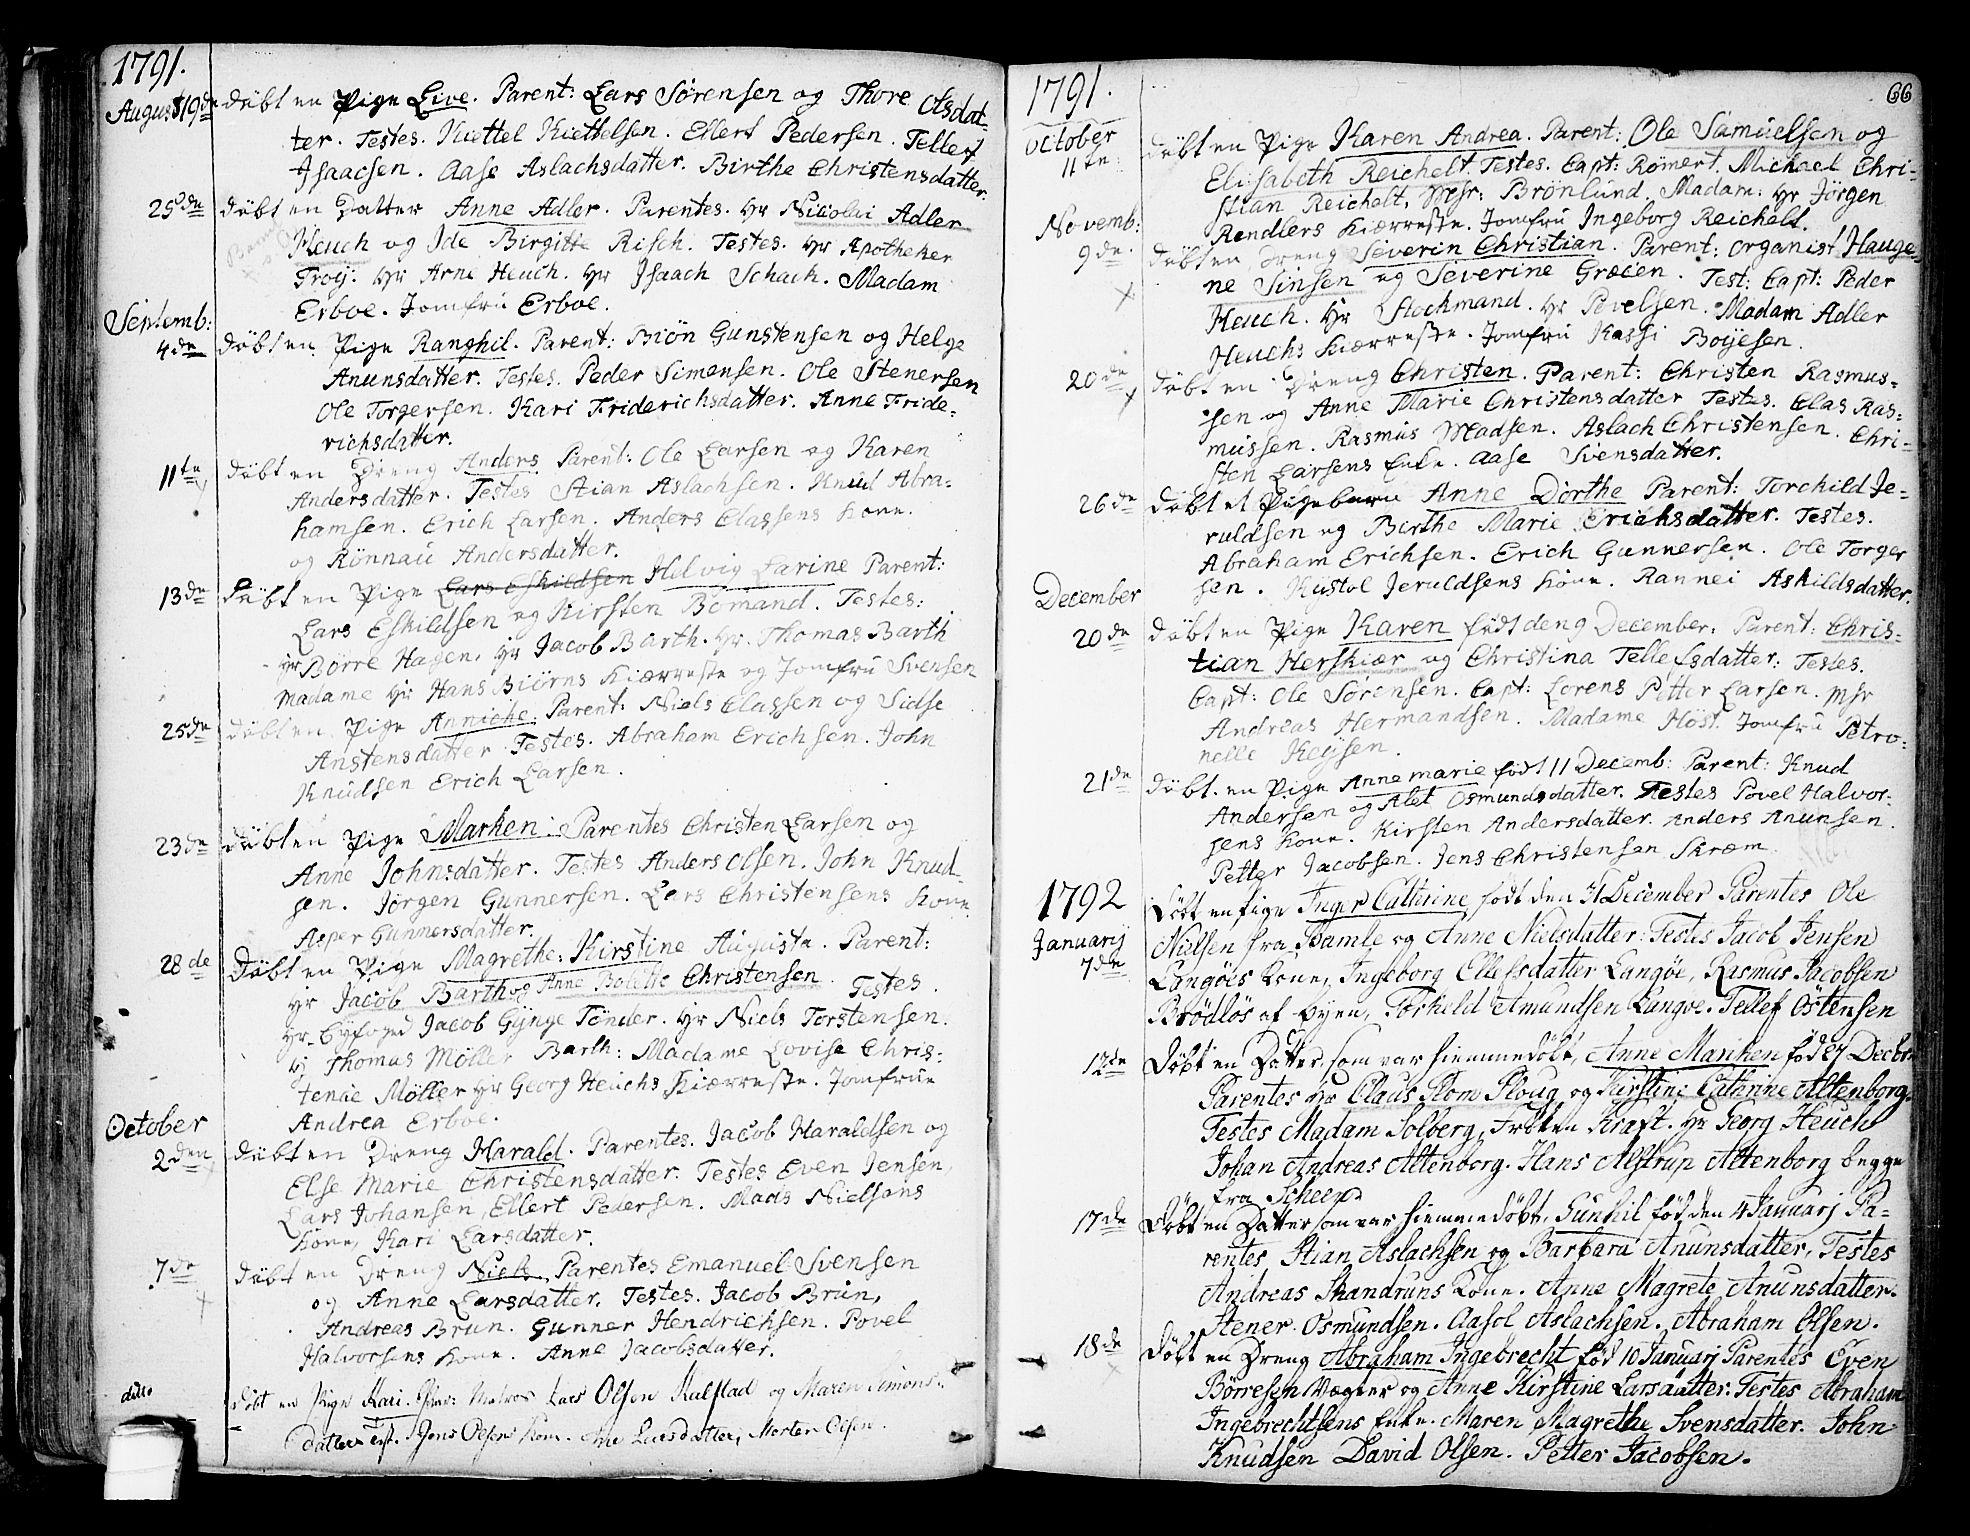 SAKO, Kragerø kirkebøker, F/Fa/L0002: Ministerialbok nr. 2, 1767-1802, s. 66